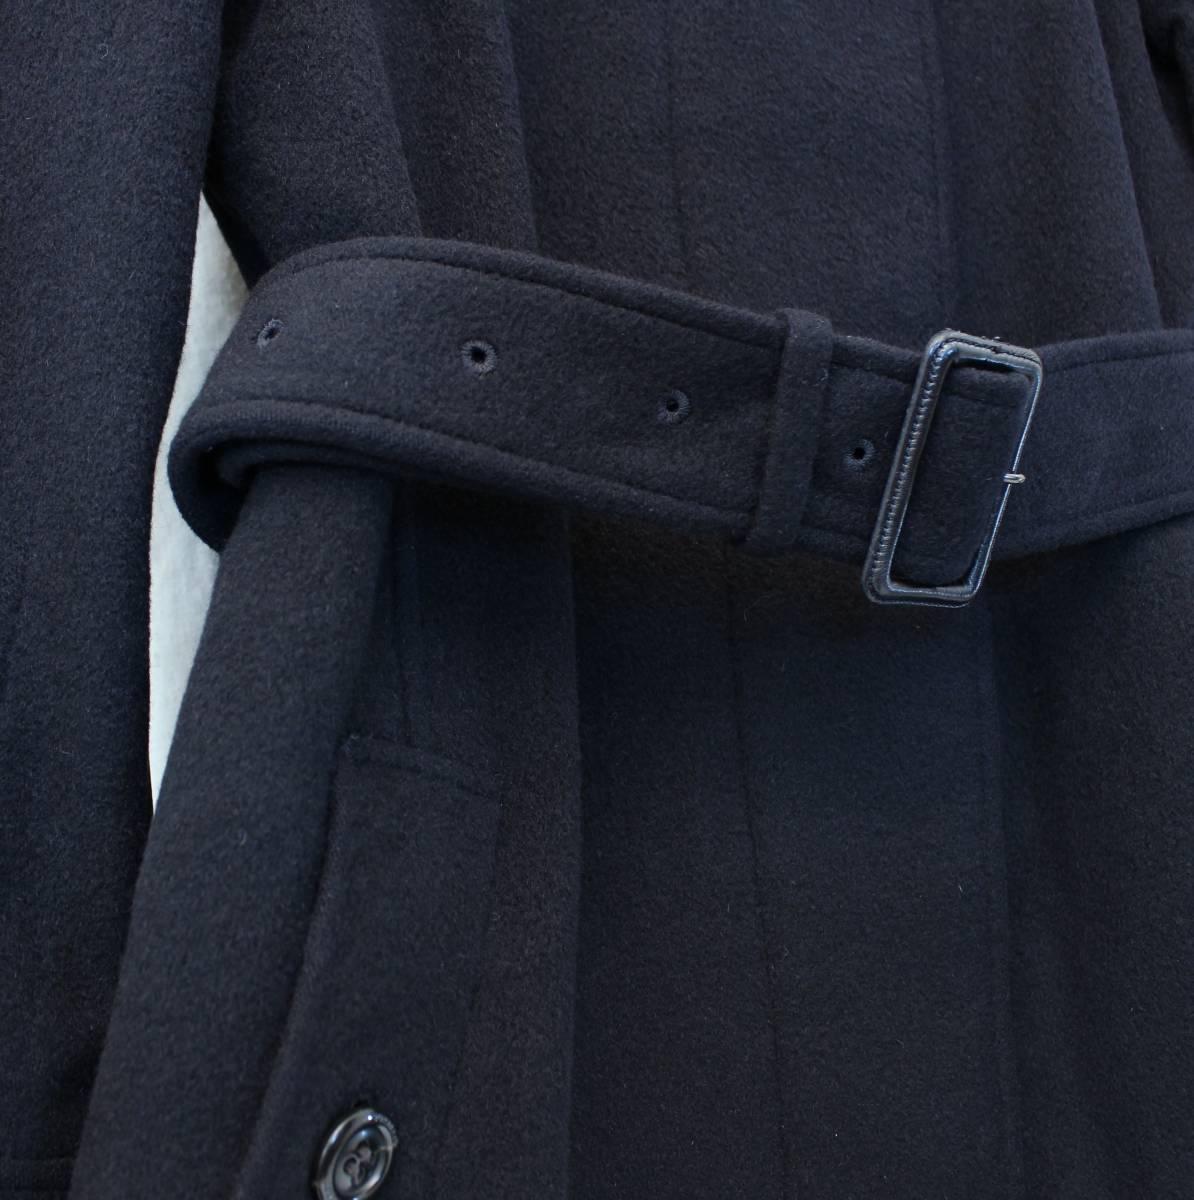 BURBERRY LONDON ANGORA BREND WOOL BELTED COAT MADE IN JAPAN/バーバリーロンドンアンゴラ混ウールベルテッドコート_画像4